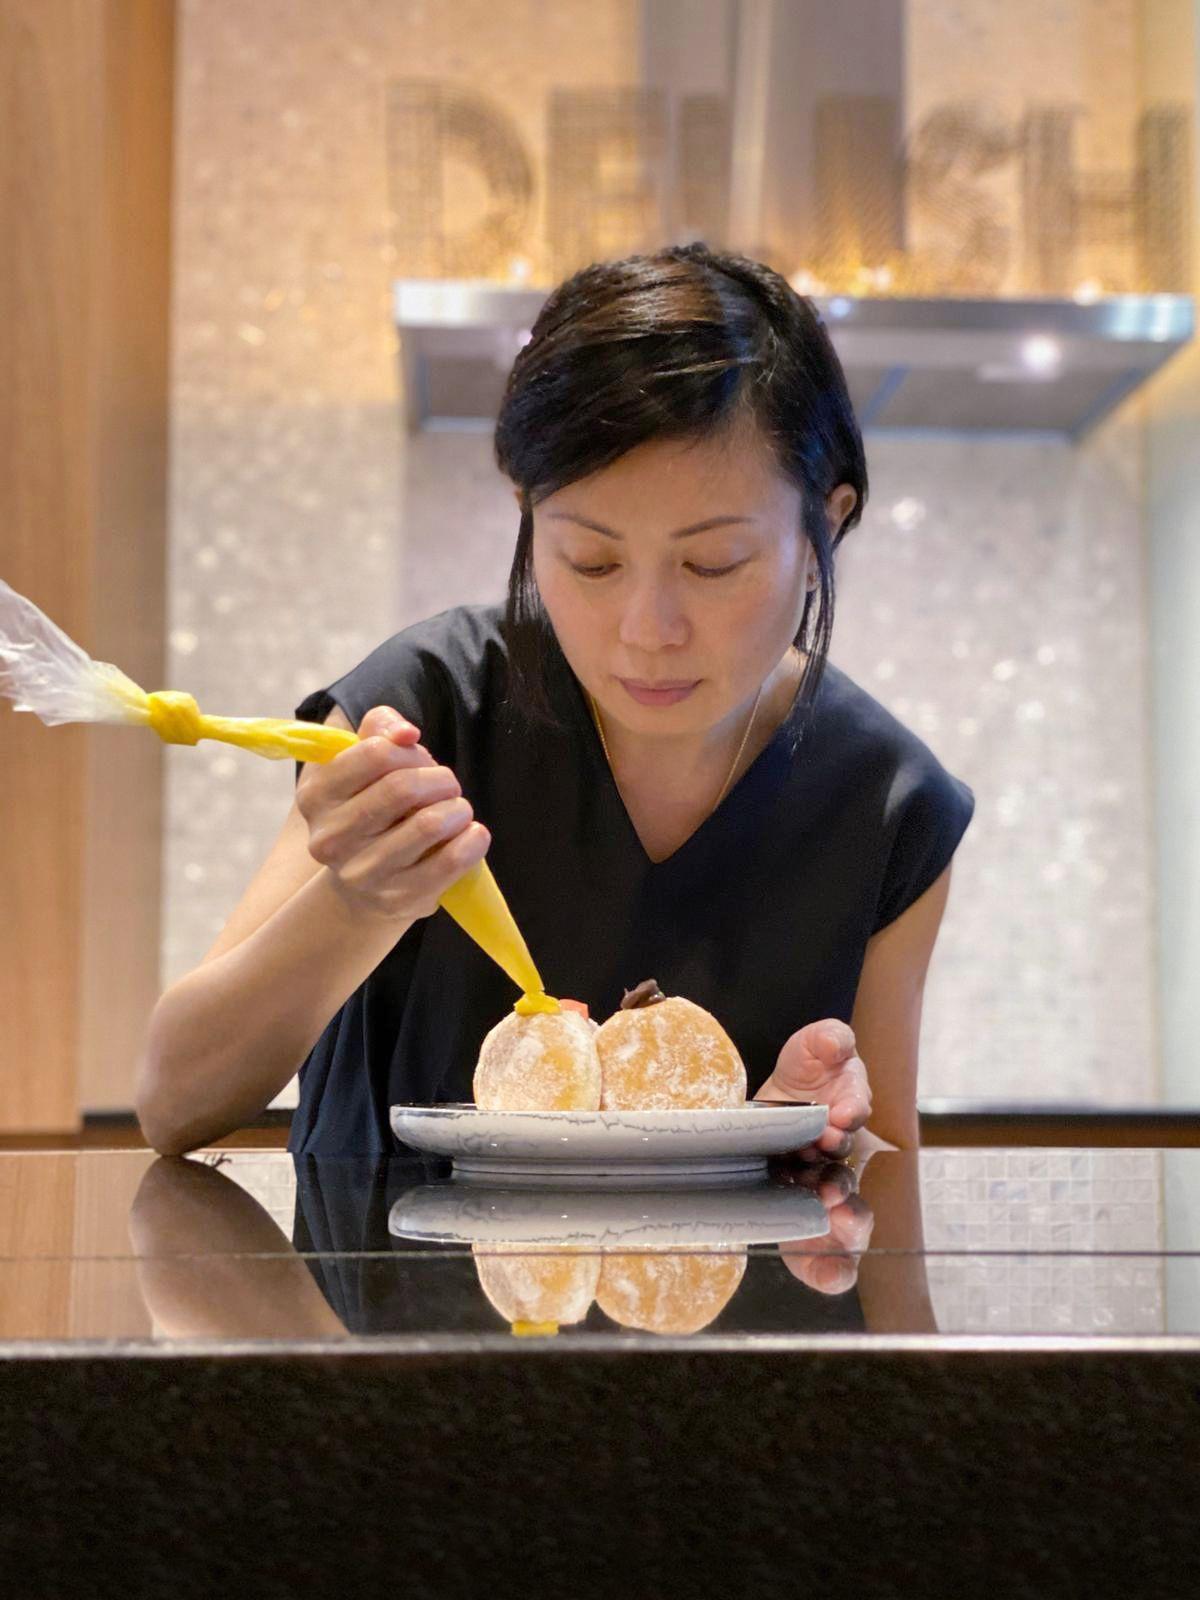 Mantan manager hotel sukses jualan donat durian pengat